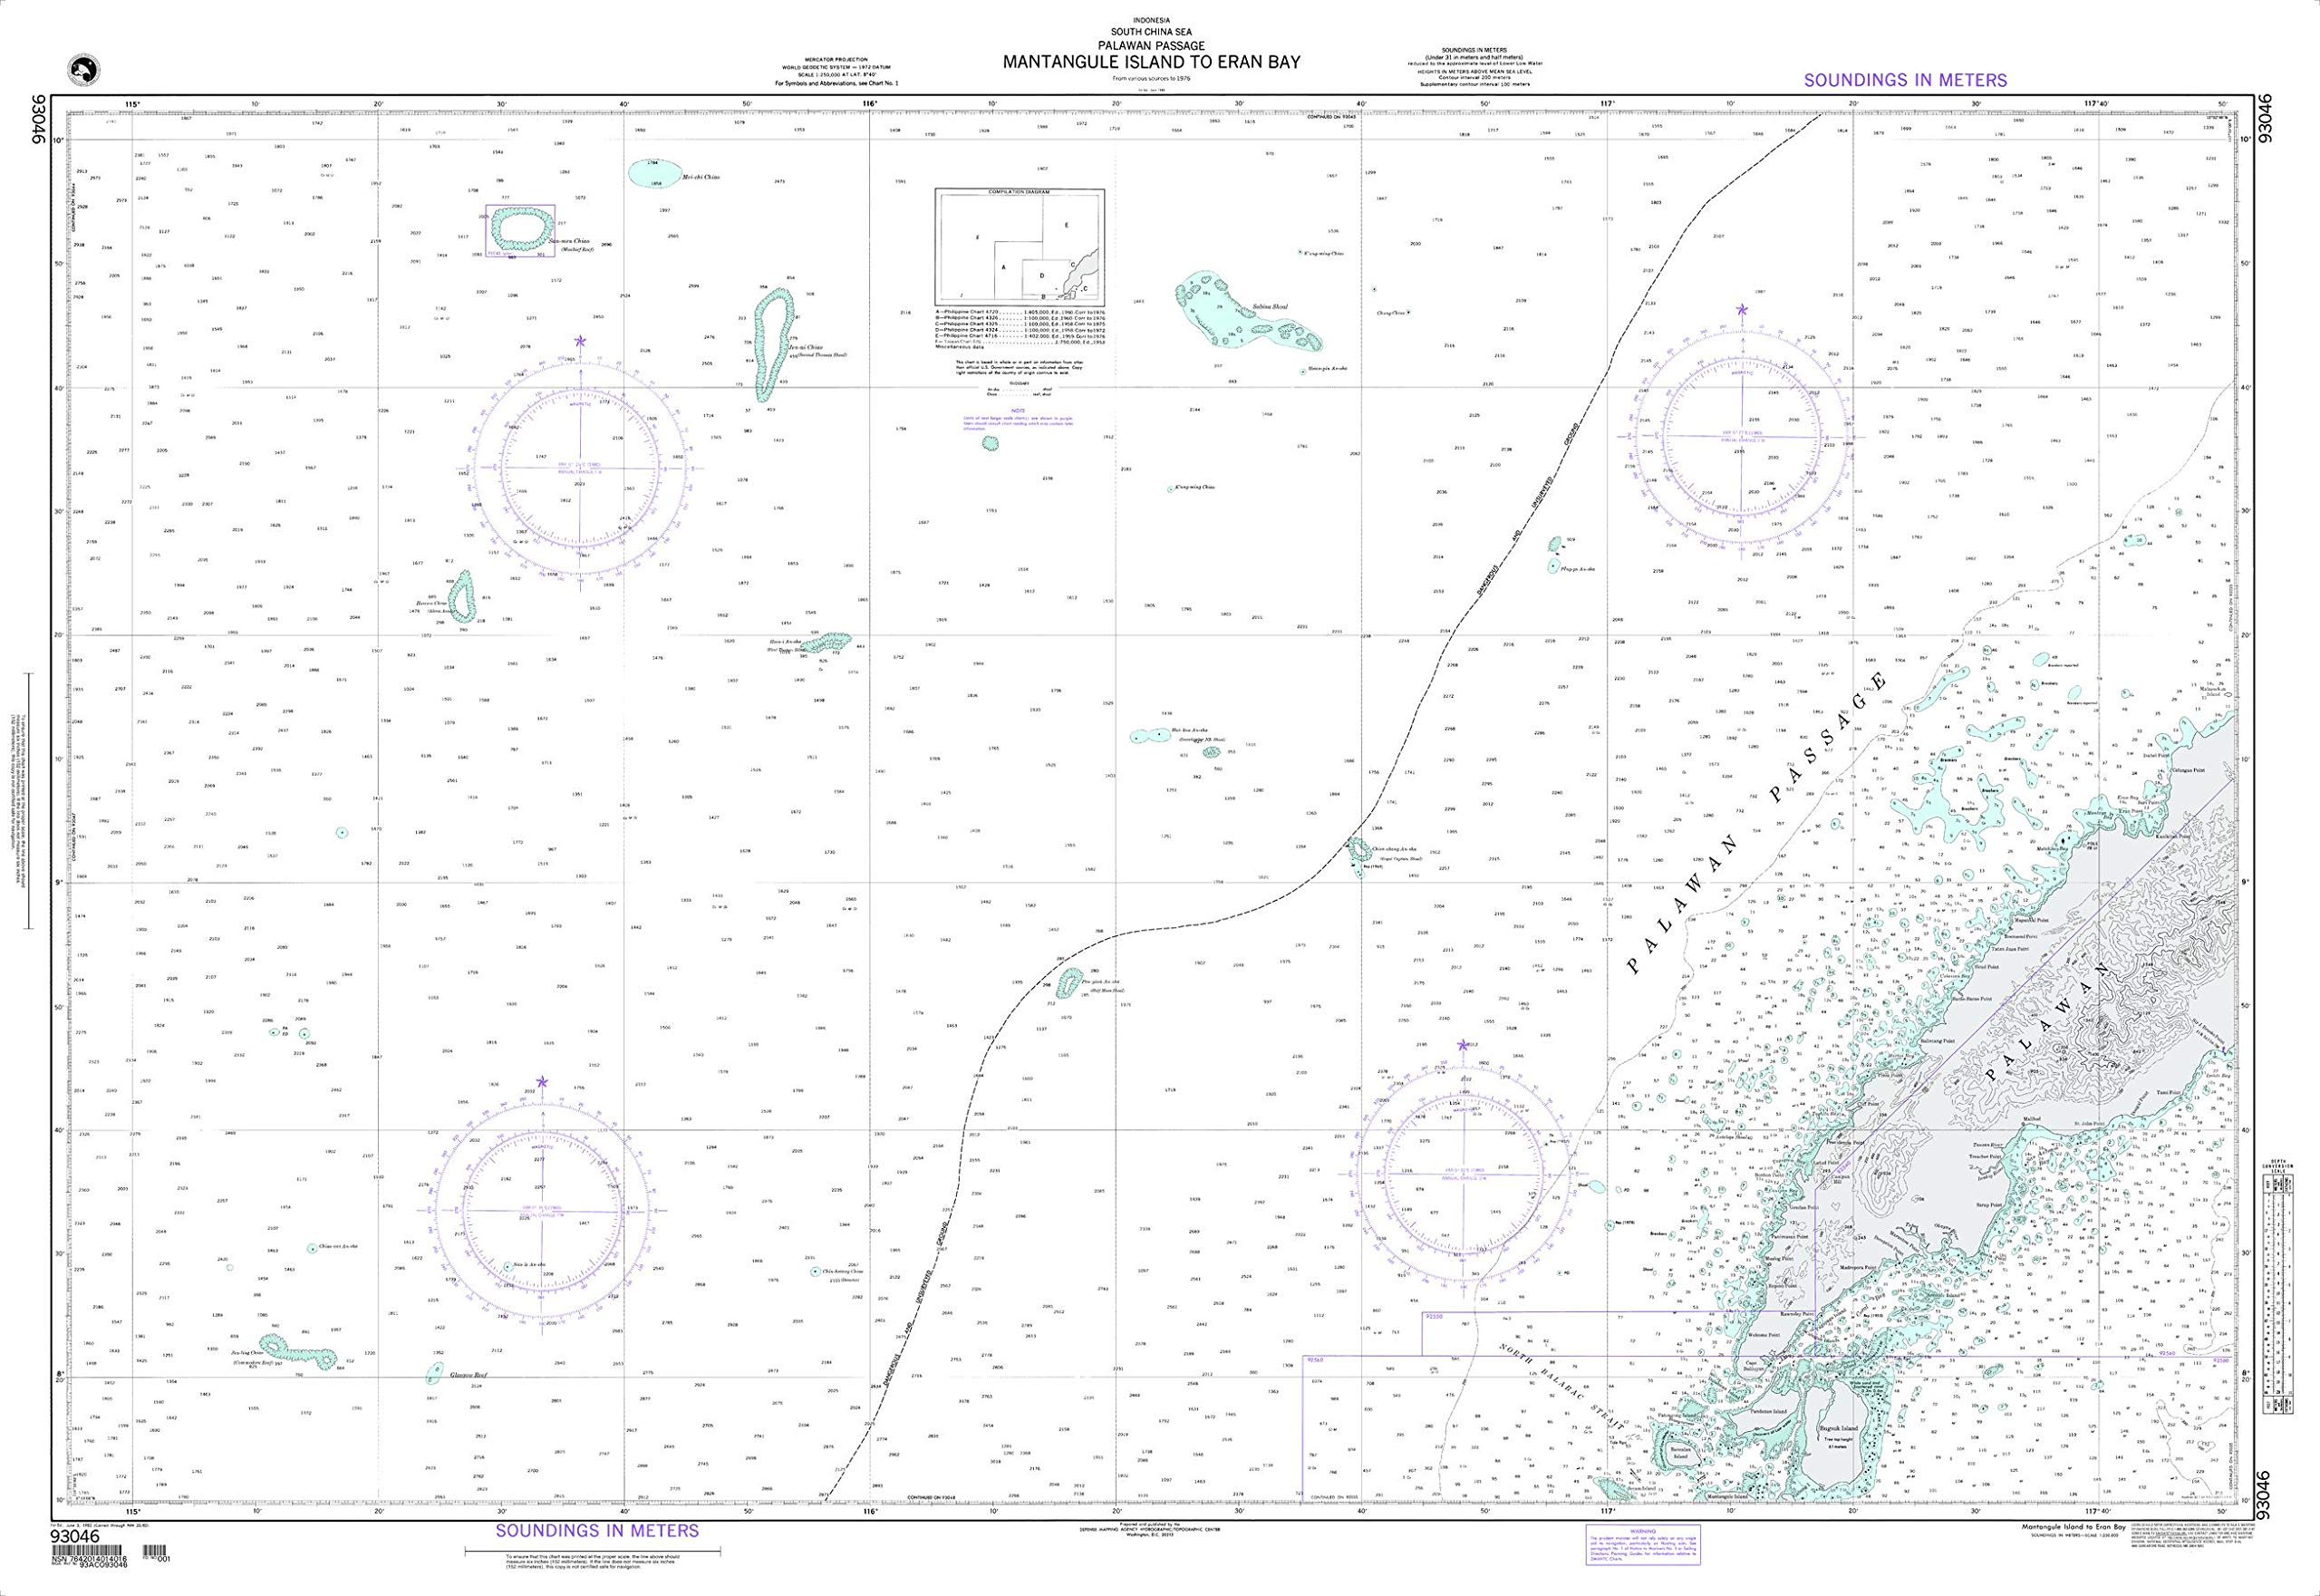 NGA Chart 93046 Mantangule Island to Eran Bay 54.5'' x 37.5'' Paper Chart